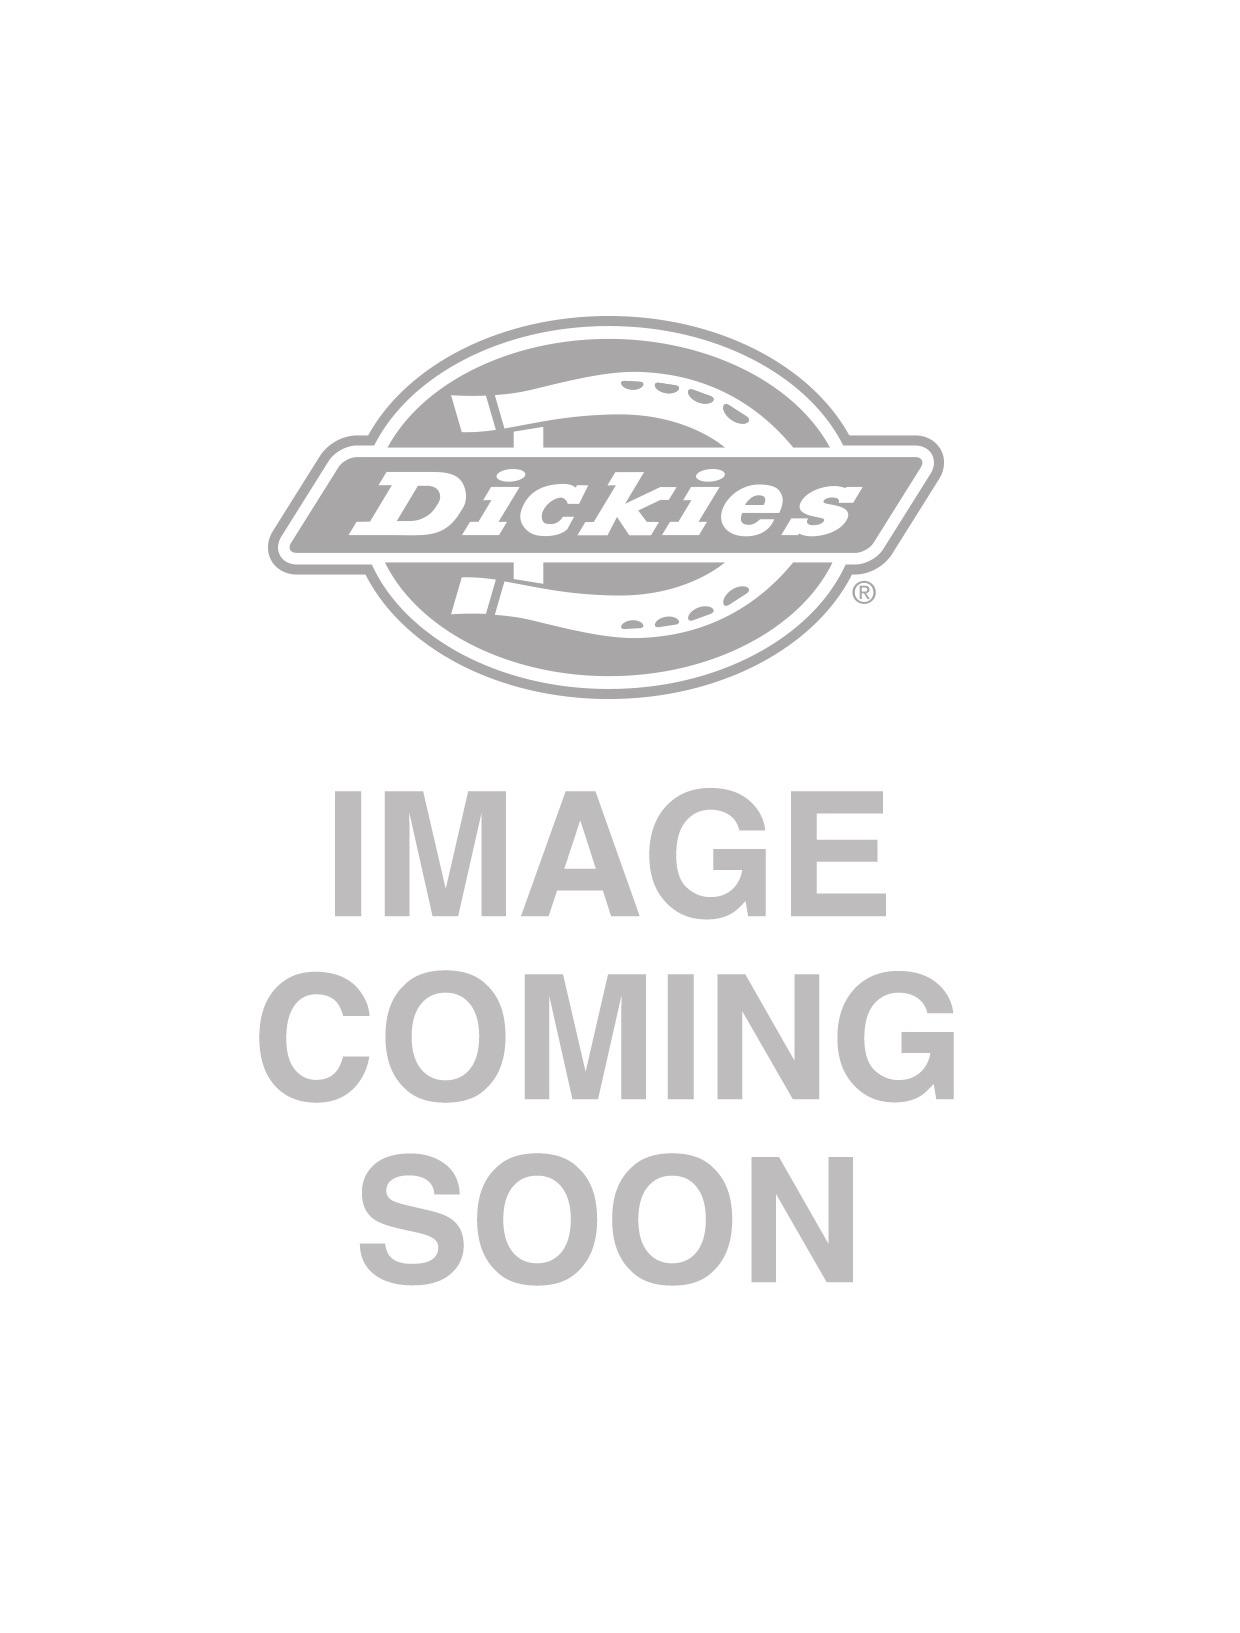 Dickies Rhode Island Short